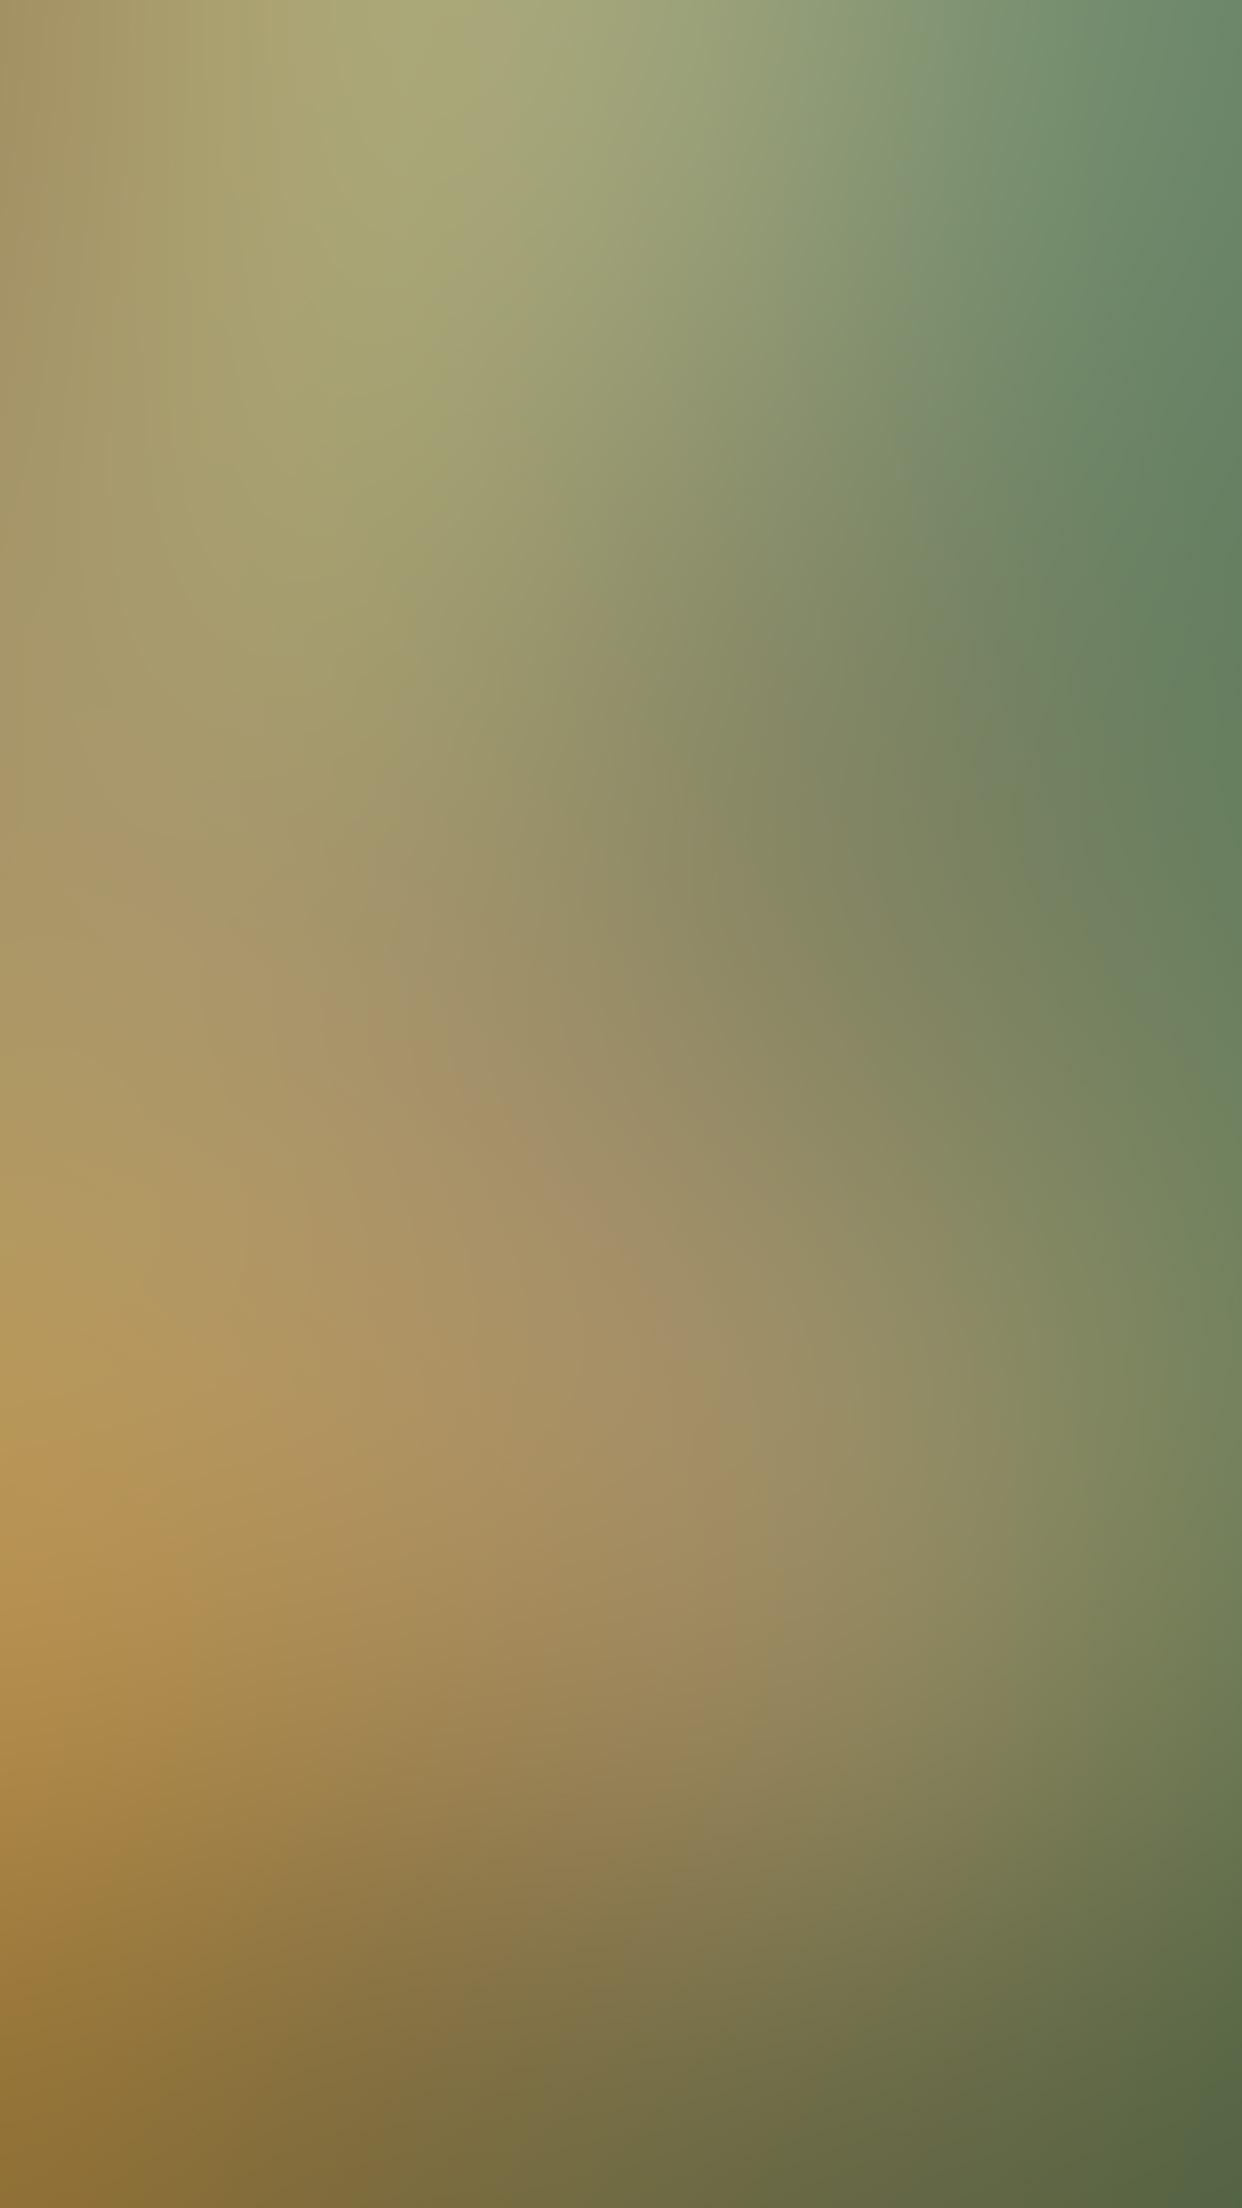 I Love Papers Sj52 Soft Yellow Green Sleepy Gradation Blur